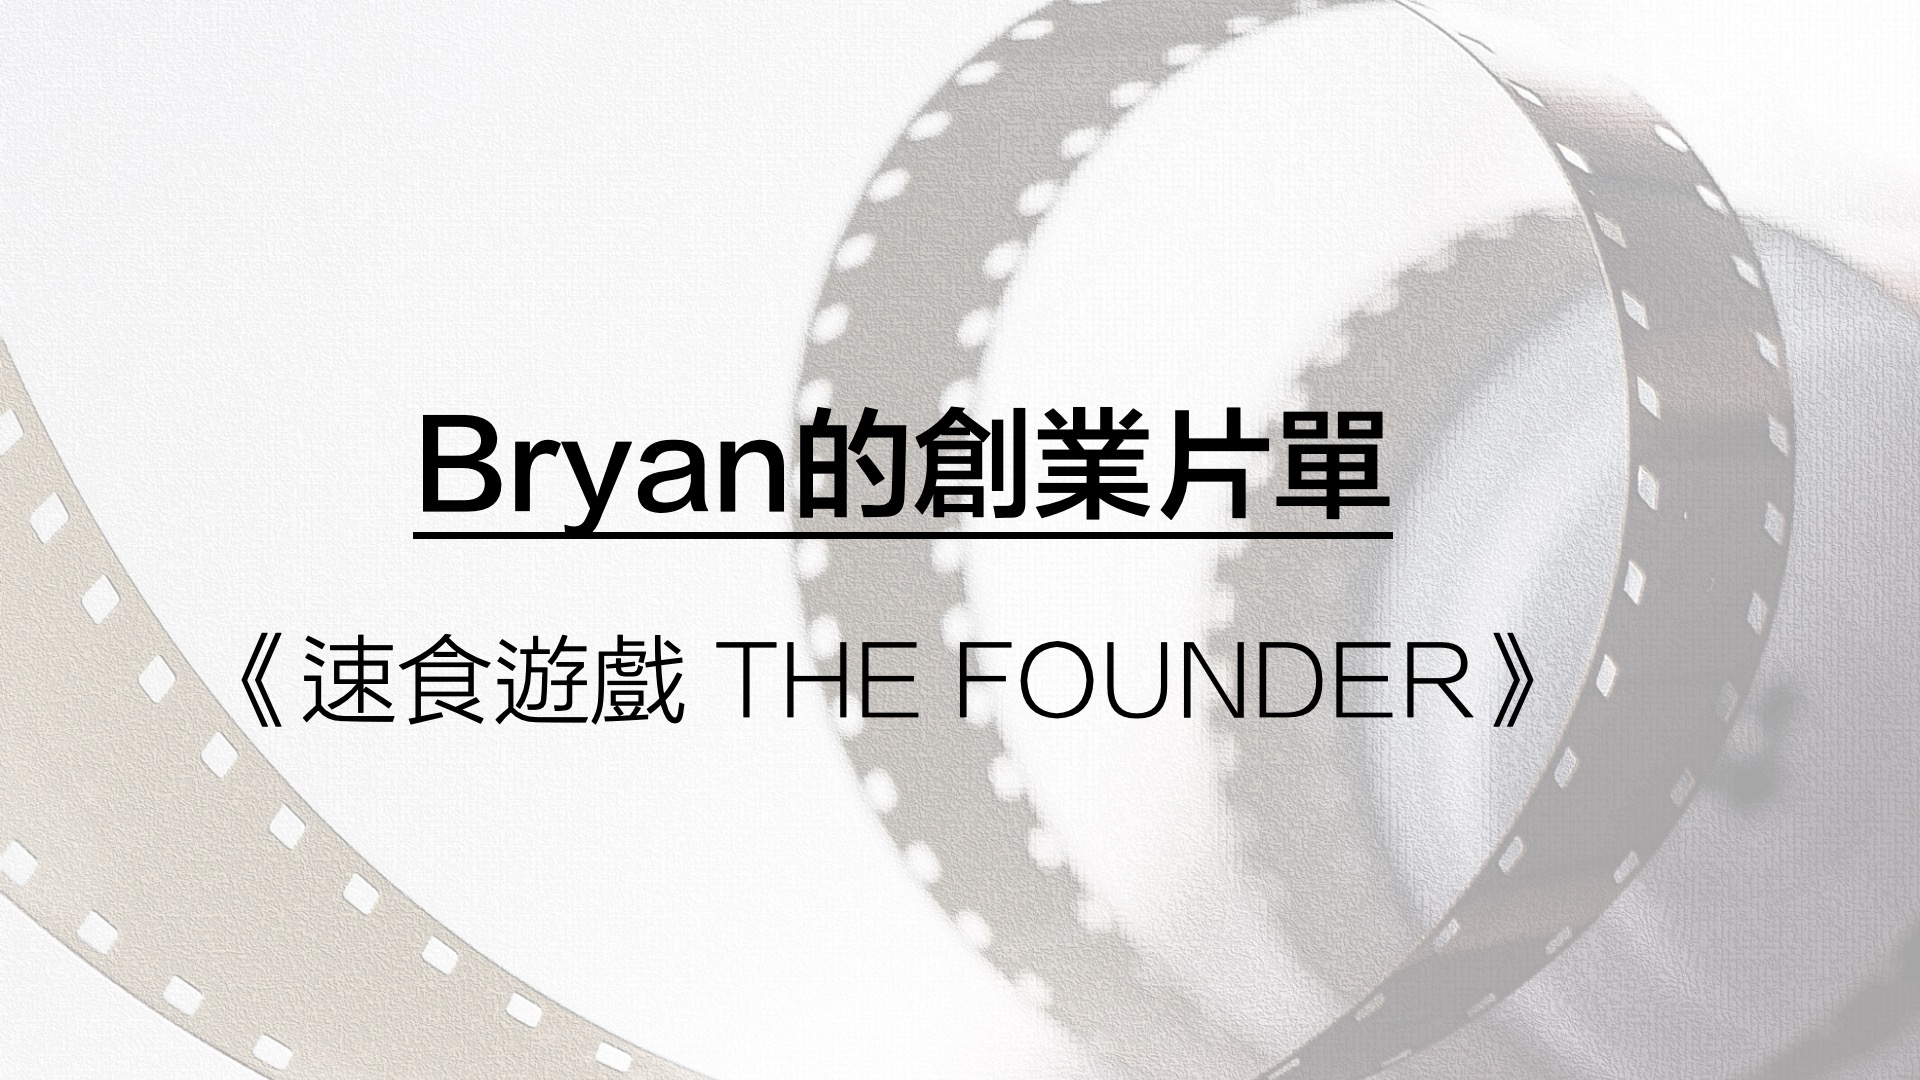 【 Bryan的創業片單】:看電影學創業-《速食遊戲 THE FOUNDER》